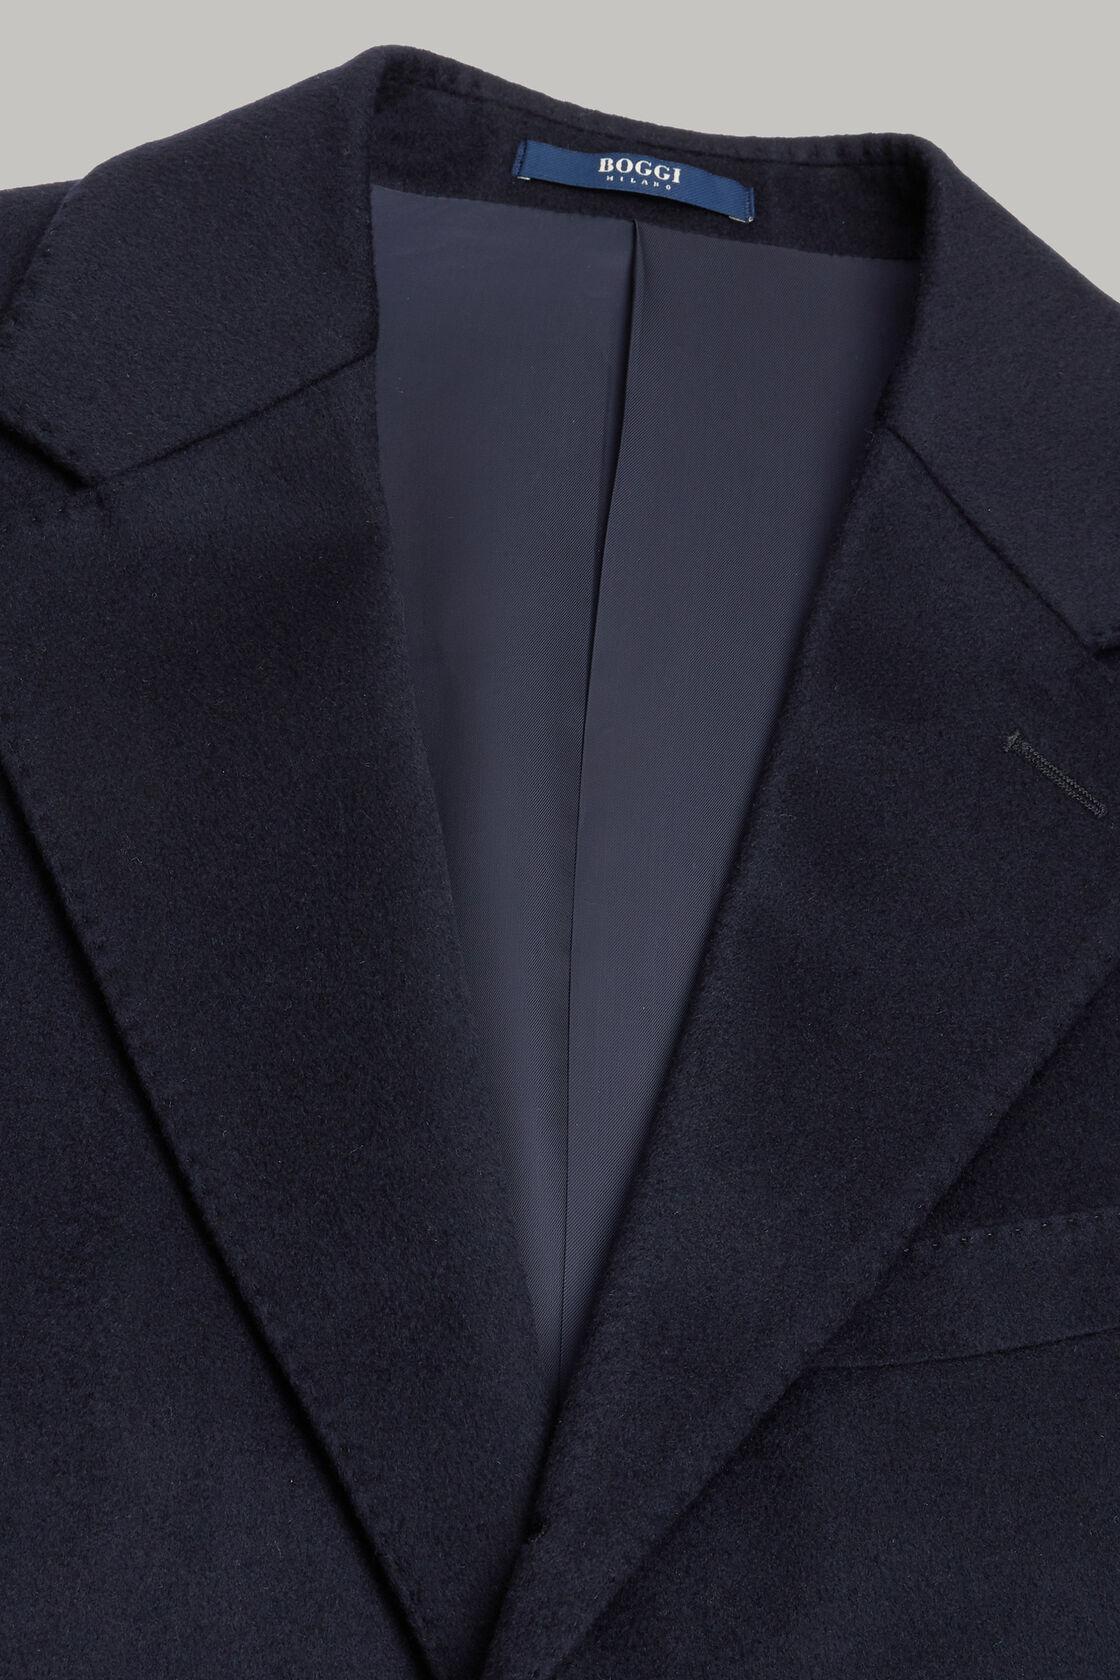 Einreihiger kaschmirmantel, Navy blau, hi-res